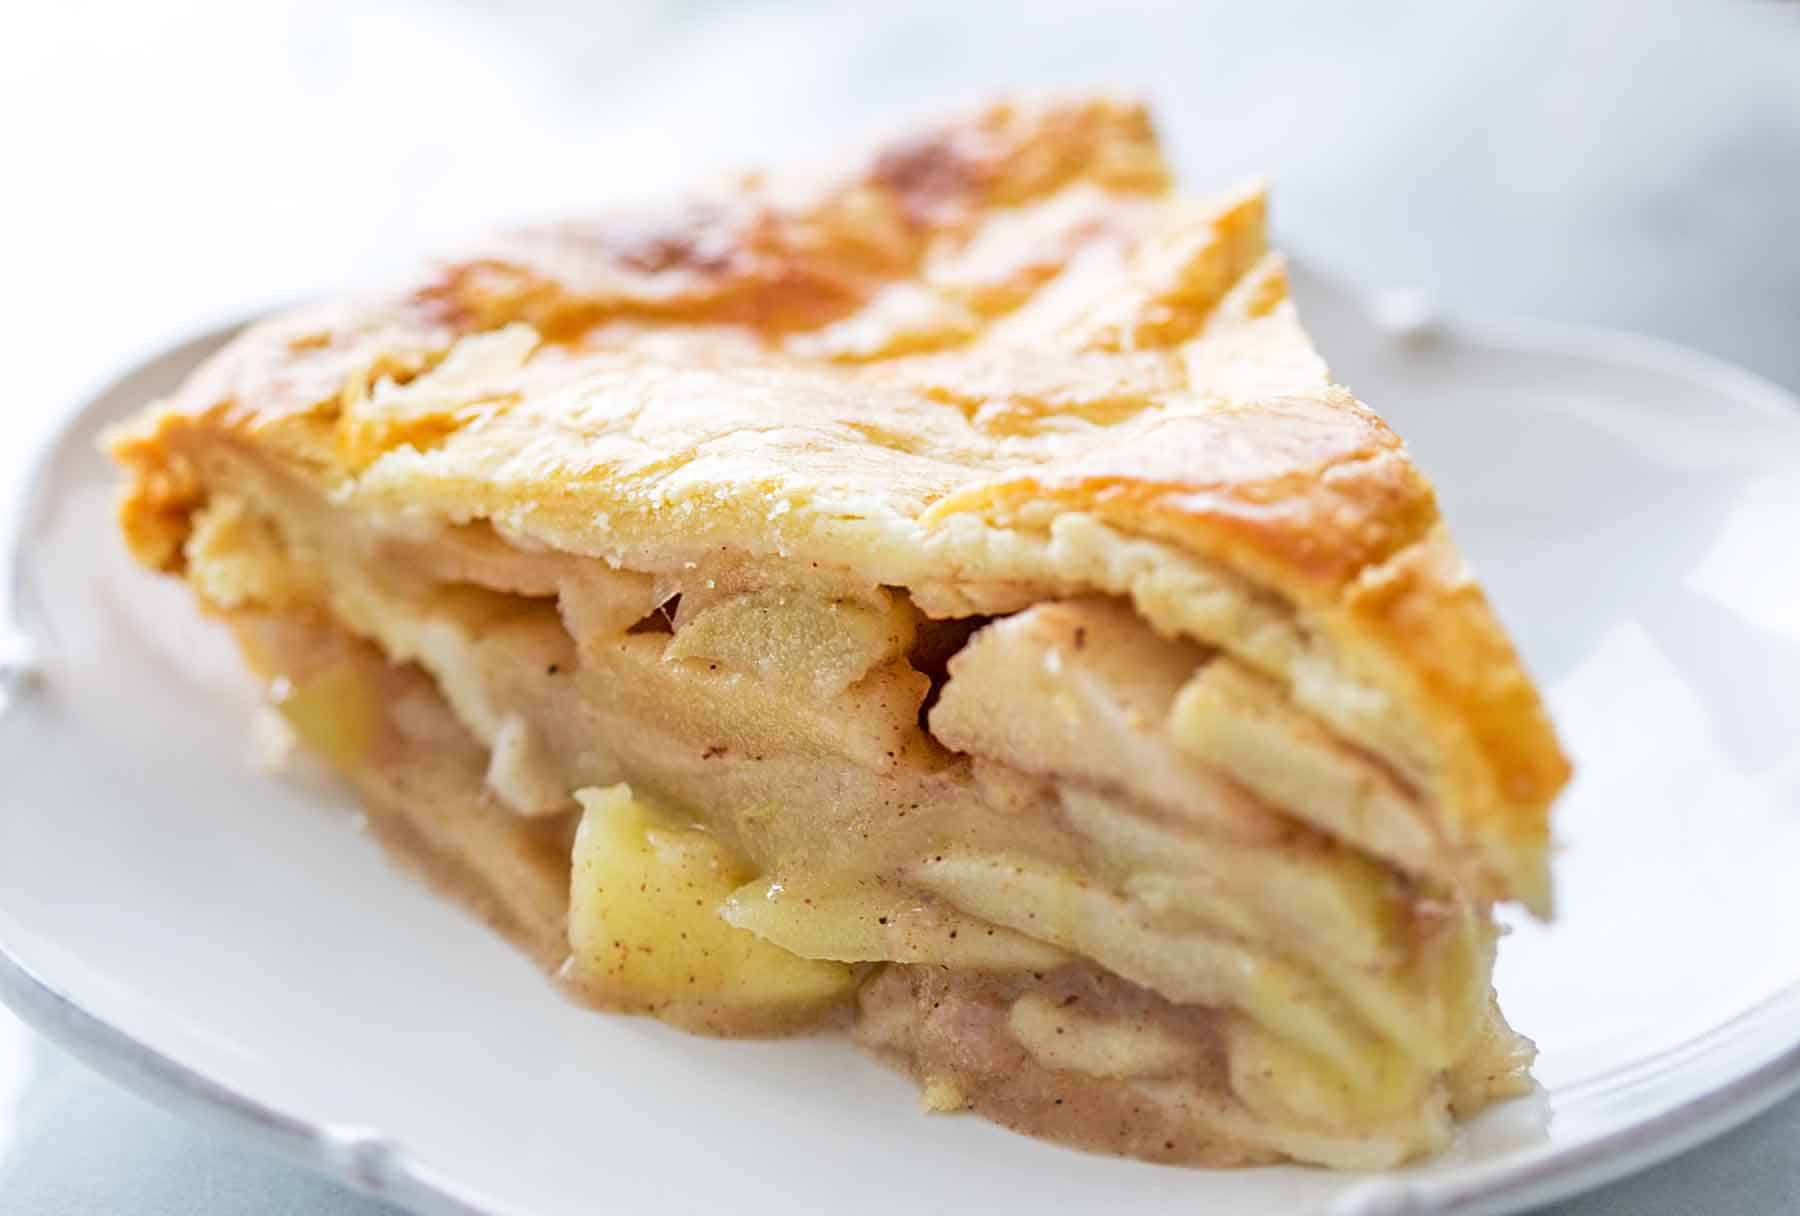 Traditional homemade apple pie